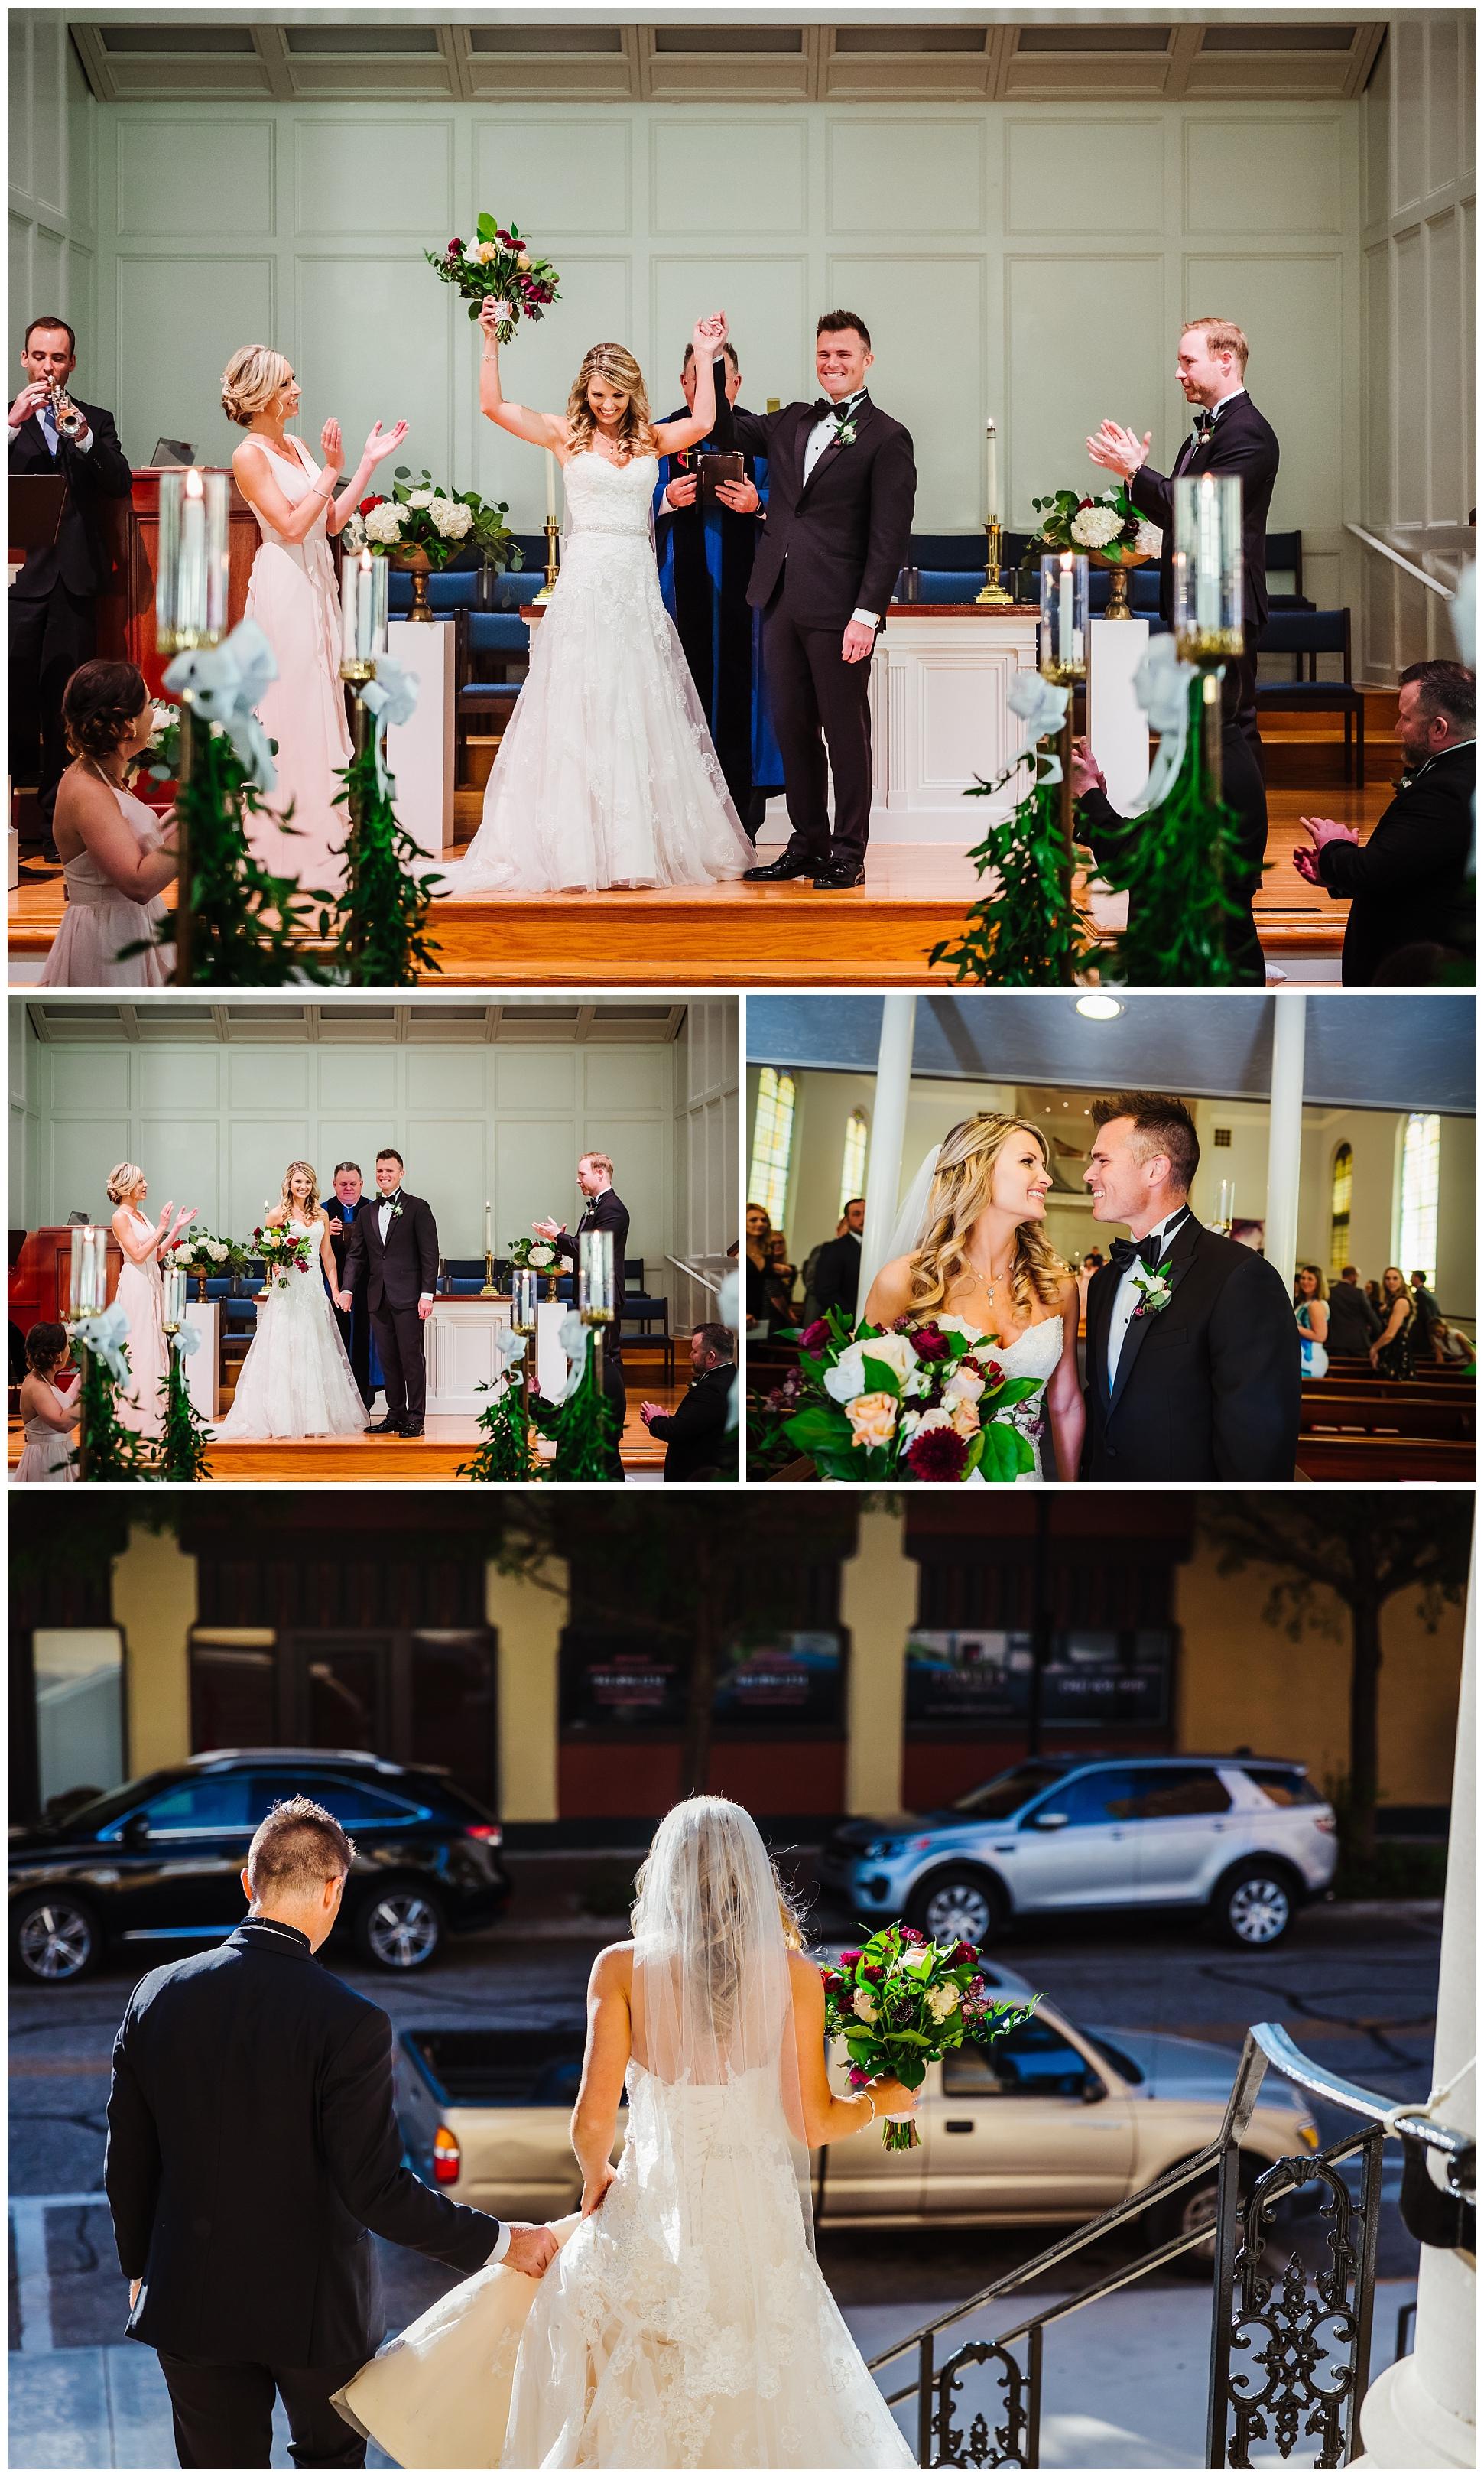 tampa-bradenton-wedding-photographer-south-florida-museum-classic-blush-gold-alpacas-sparklers_0055.jpg